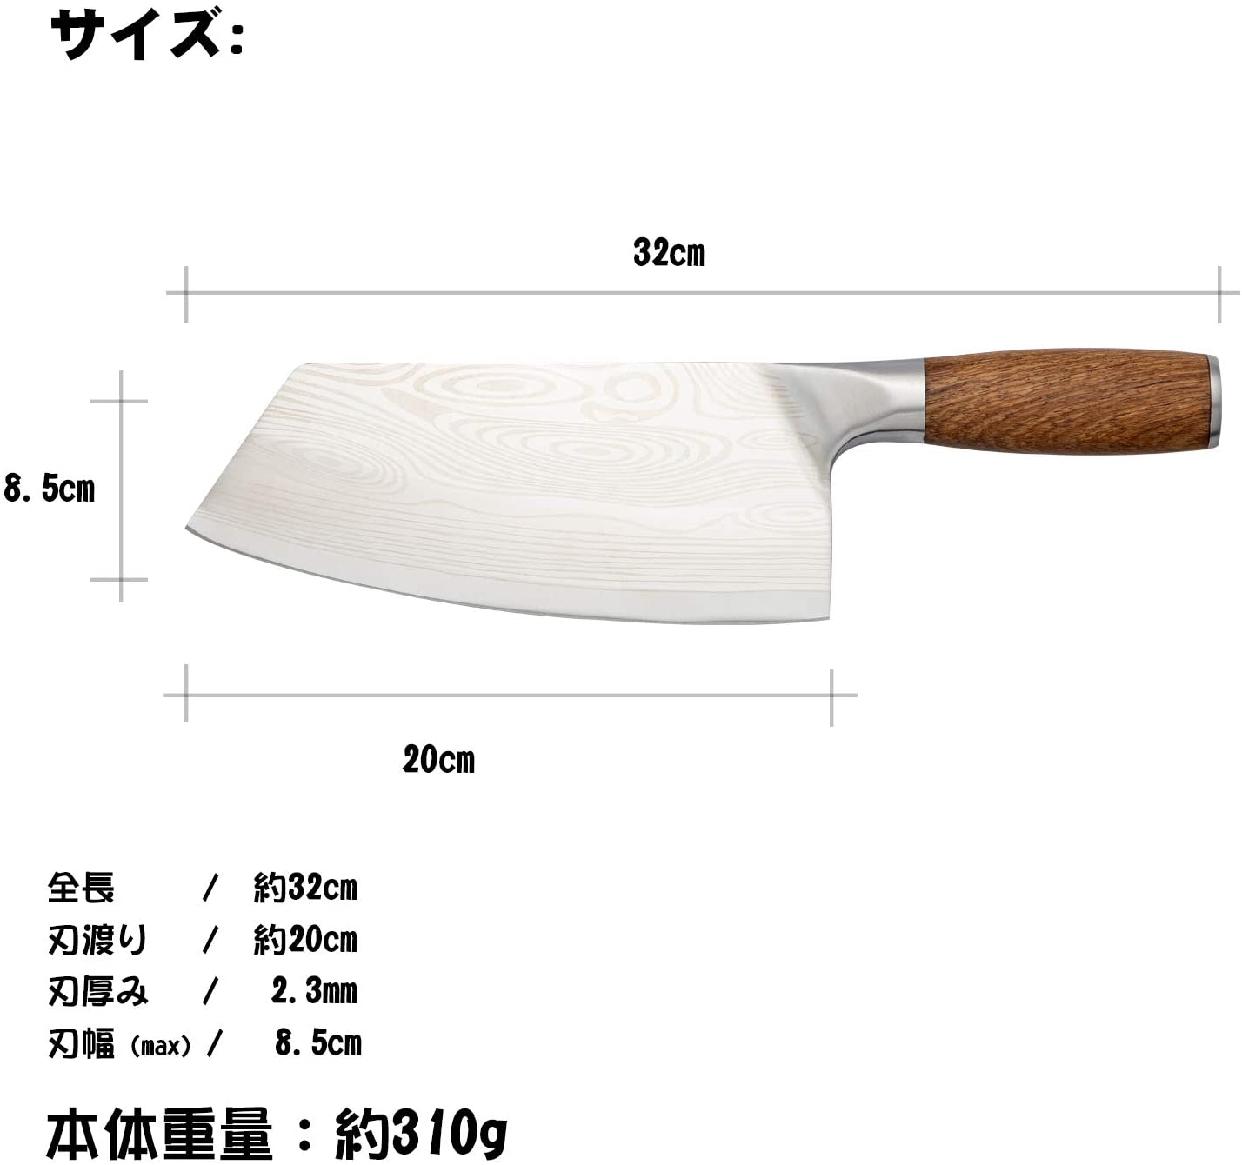 MUKAI(ムカイ) ステンレス キッチンナイフ 20cmの商品画像3